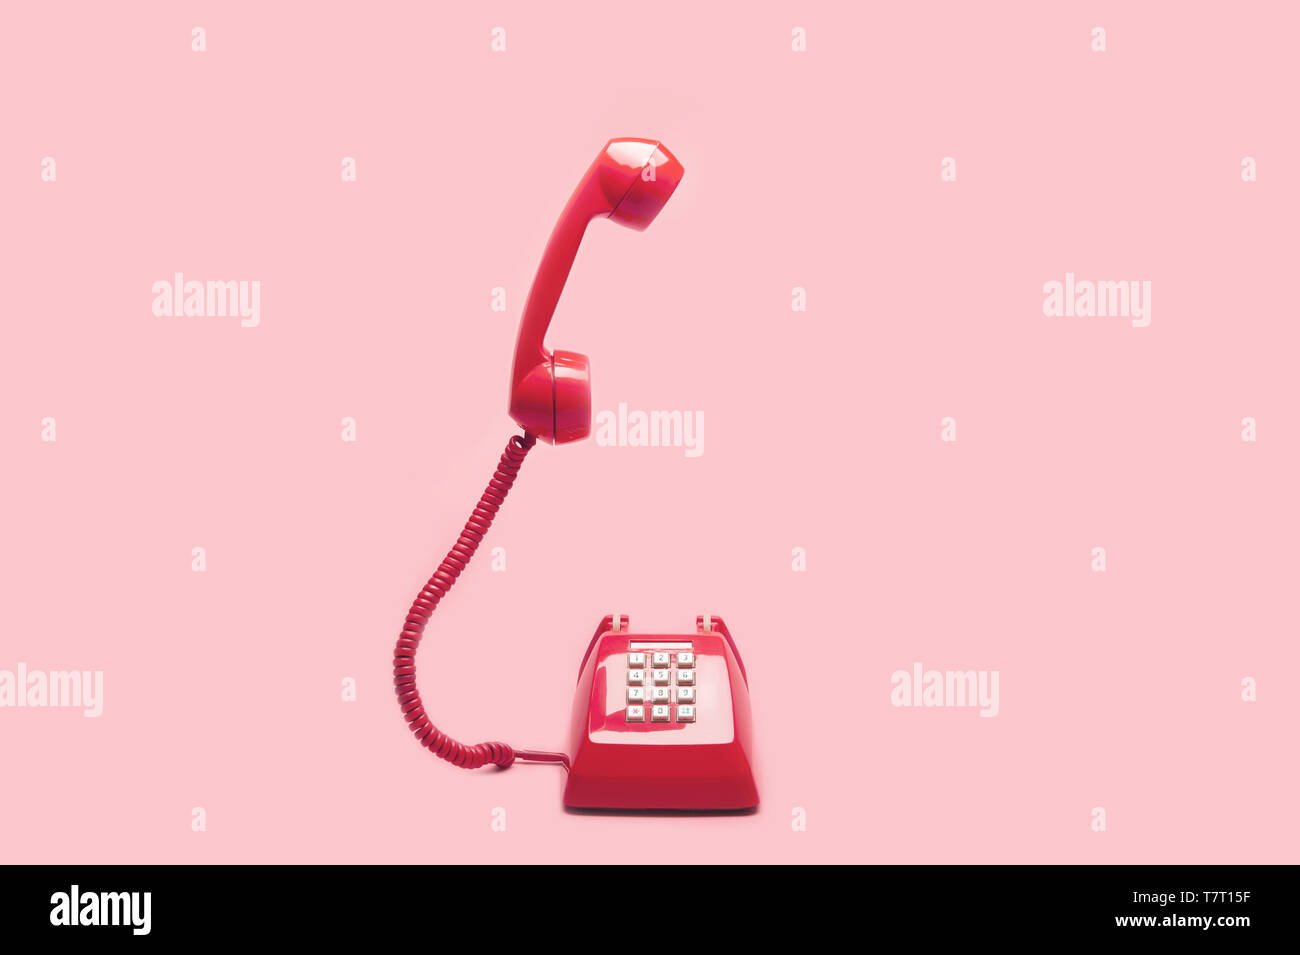 Retrò Telefono Rosa Su Sfondo Rosa Pop Art O In Stile Vintage Foto